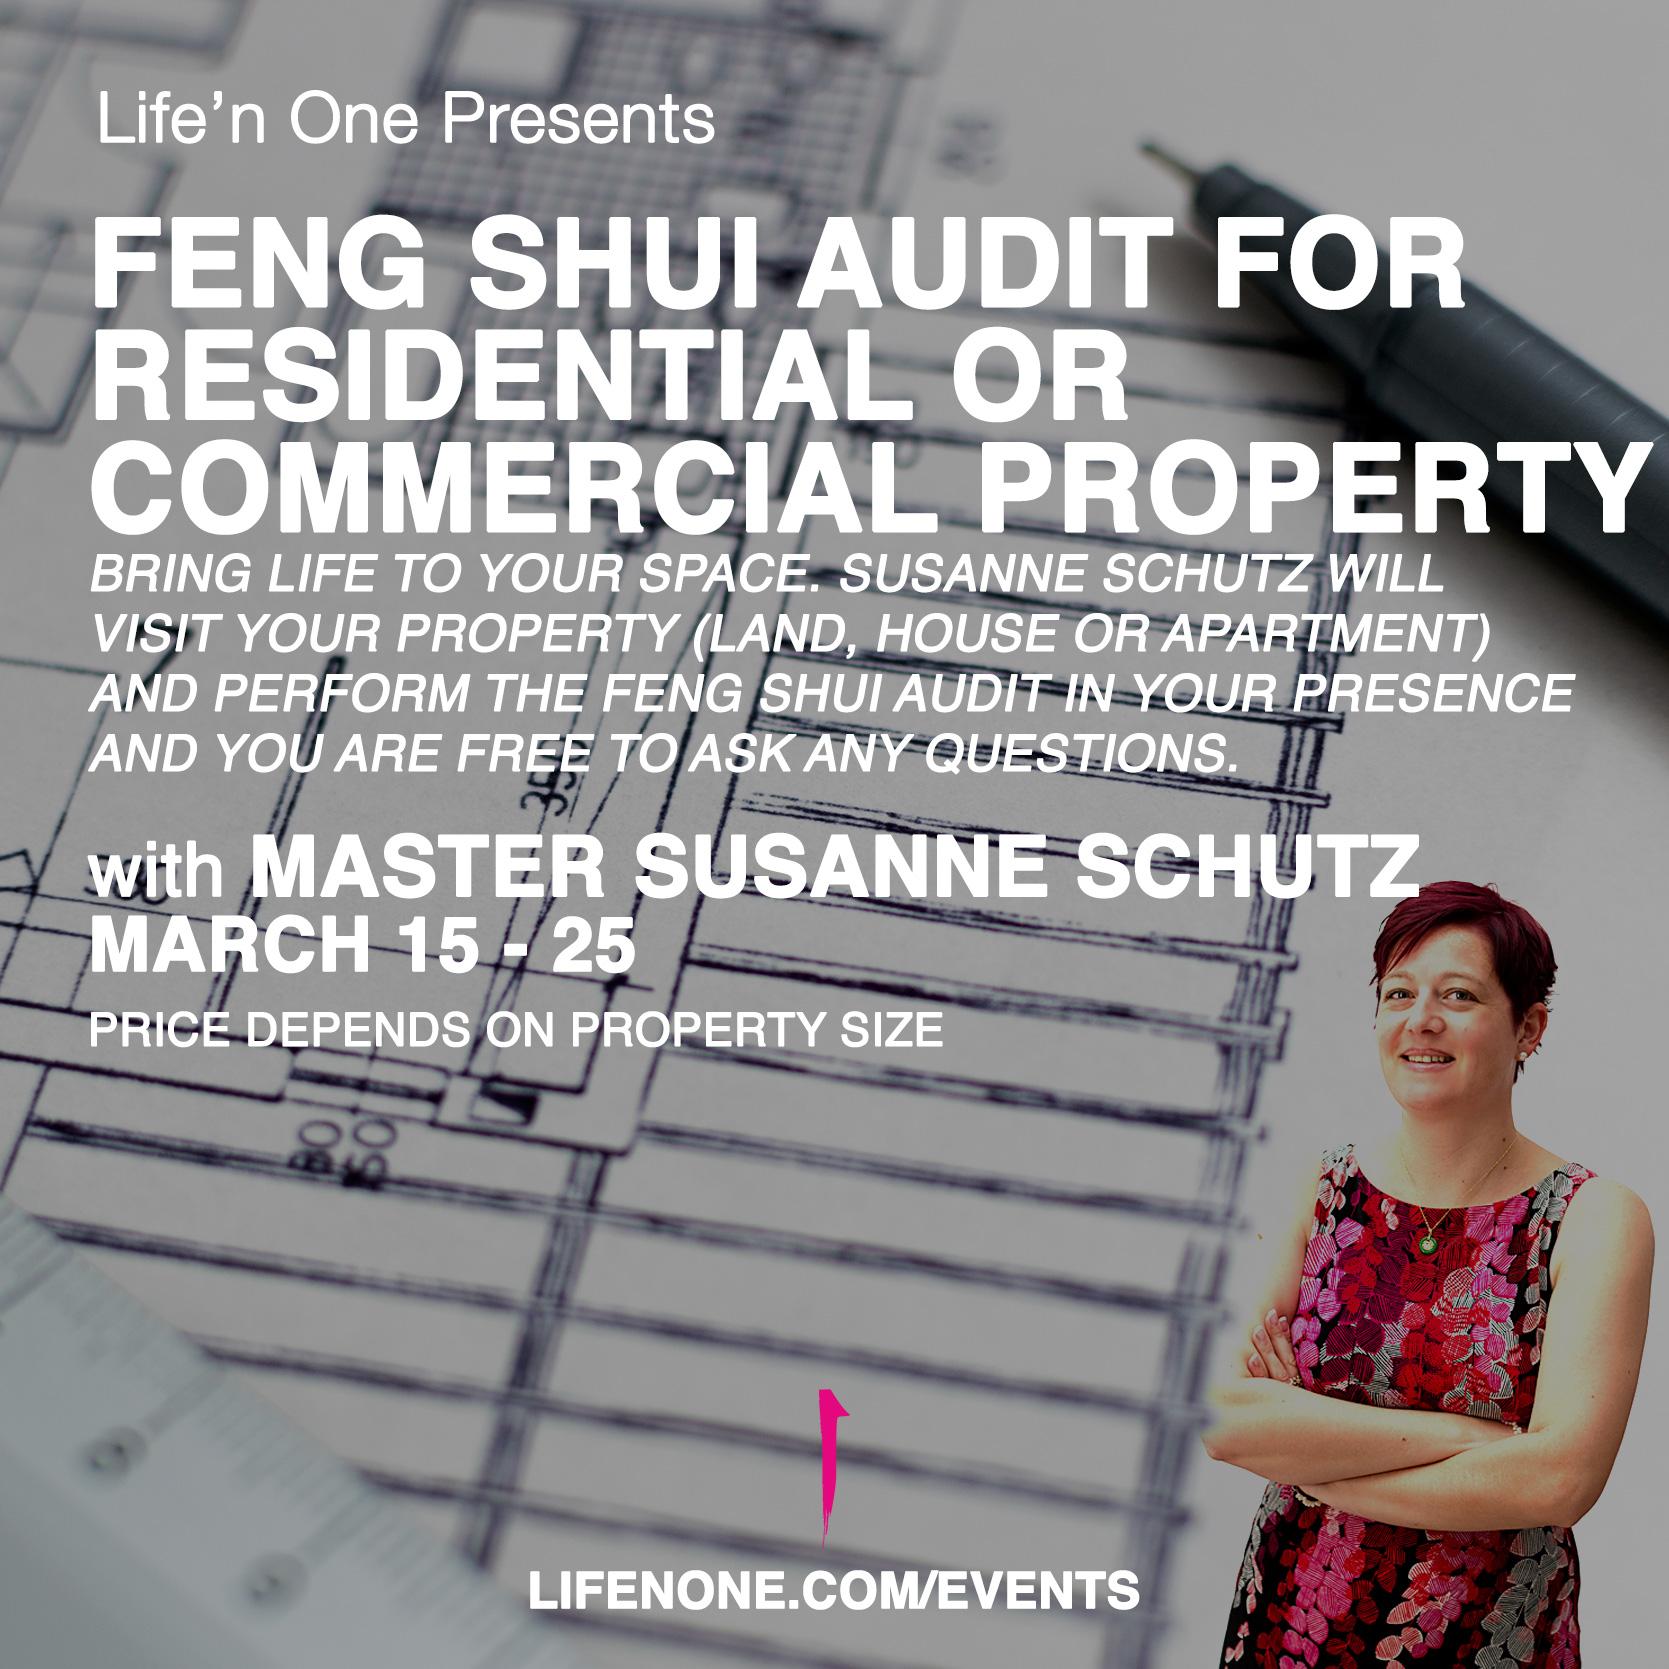 Fen Shui Consultancy for properties in Dubai